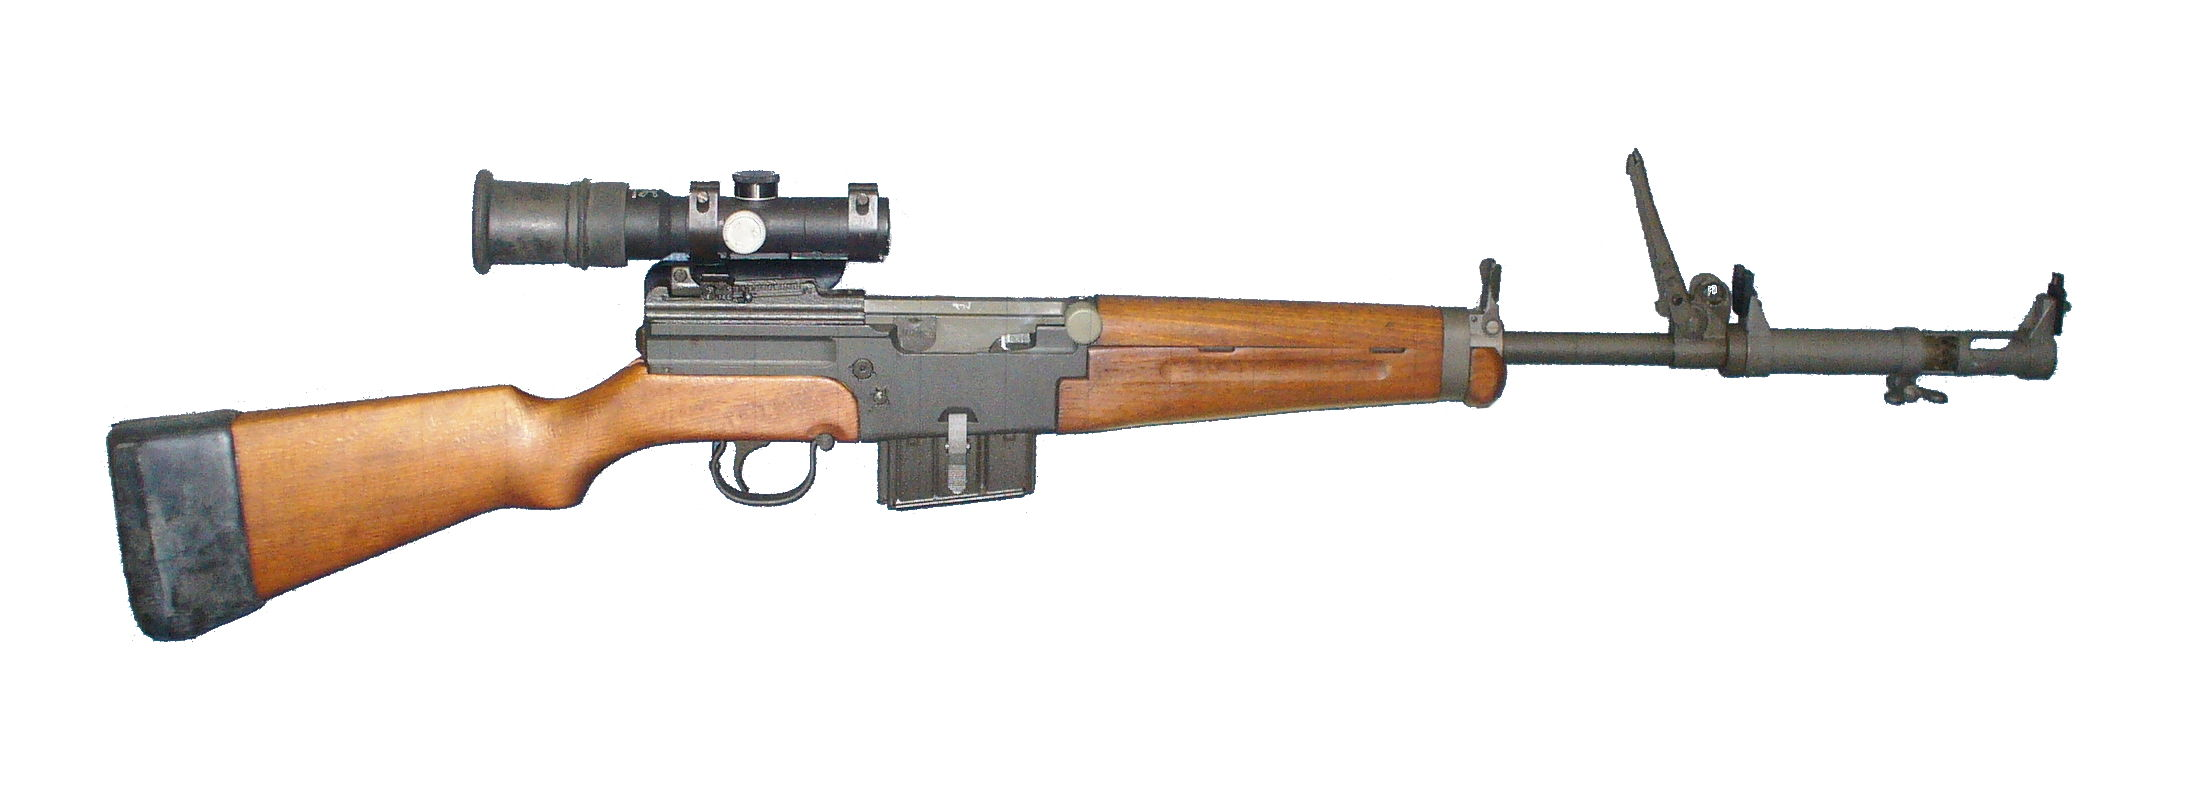 French MAS 49 56